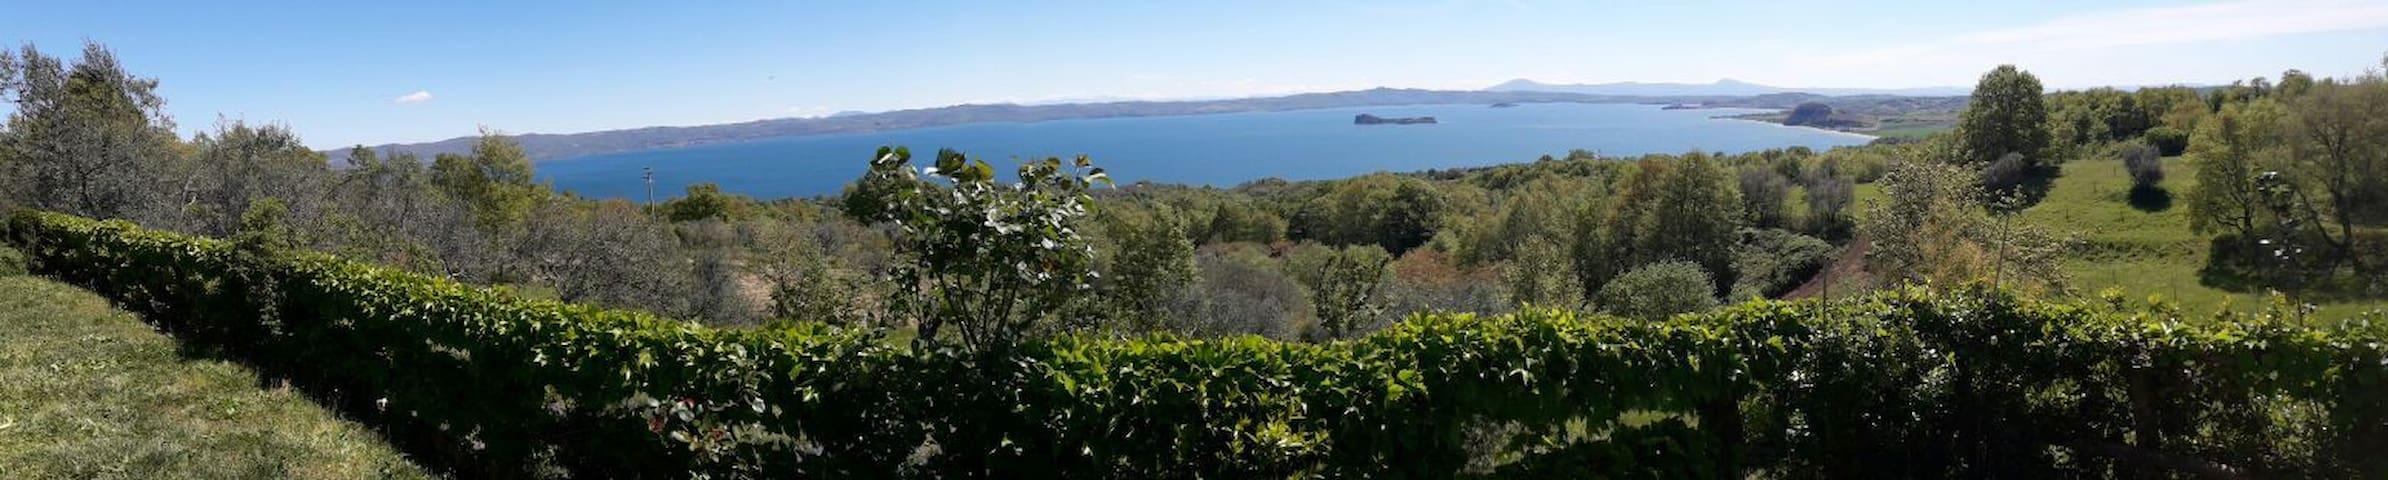 Vista panoramica e tranquillità - Gradoli - Rumah